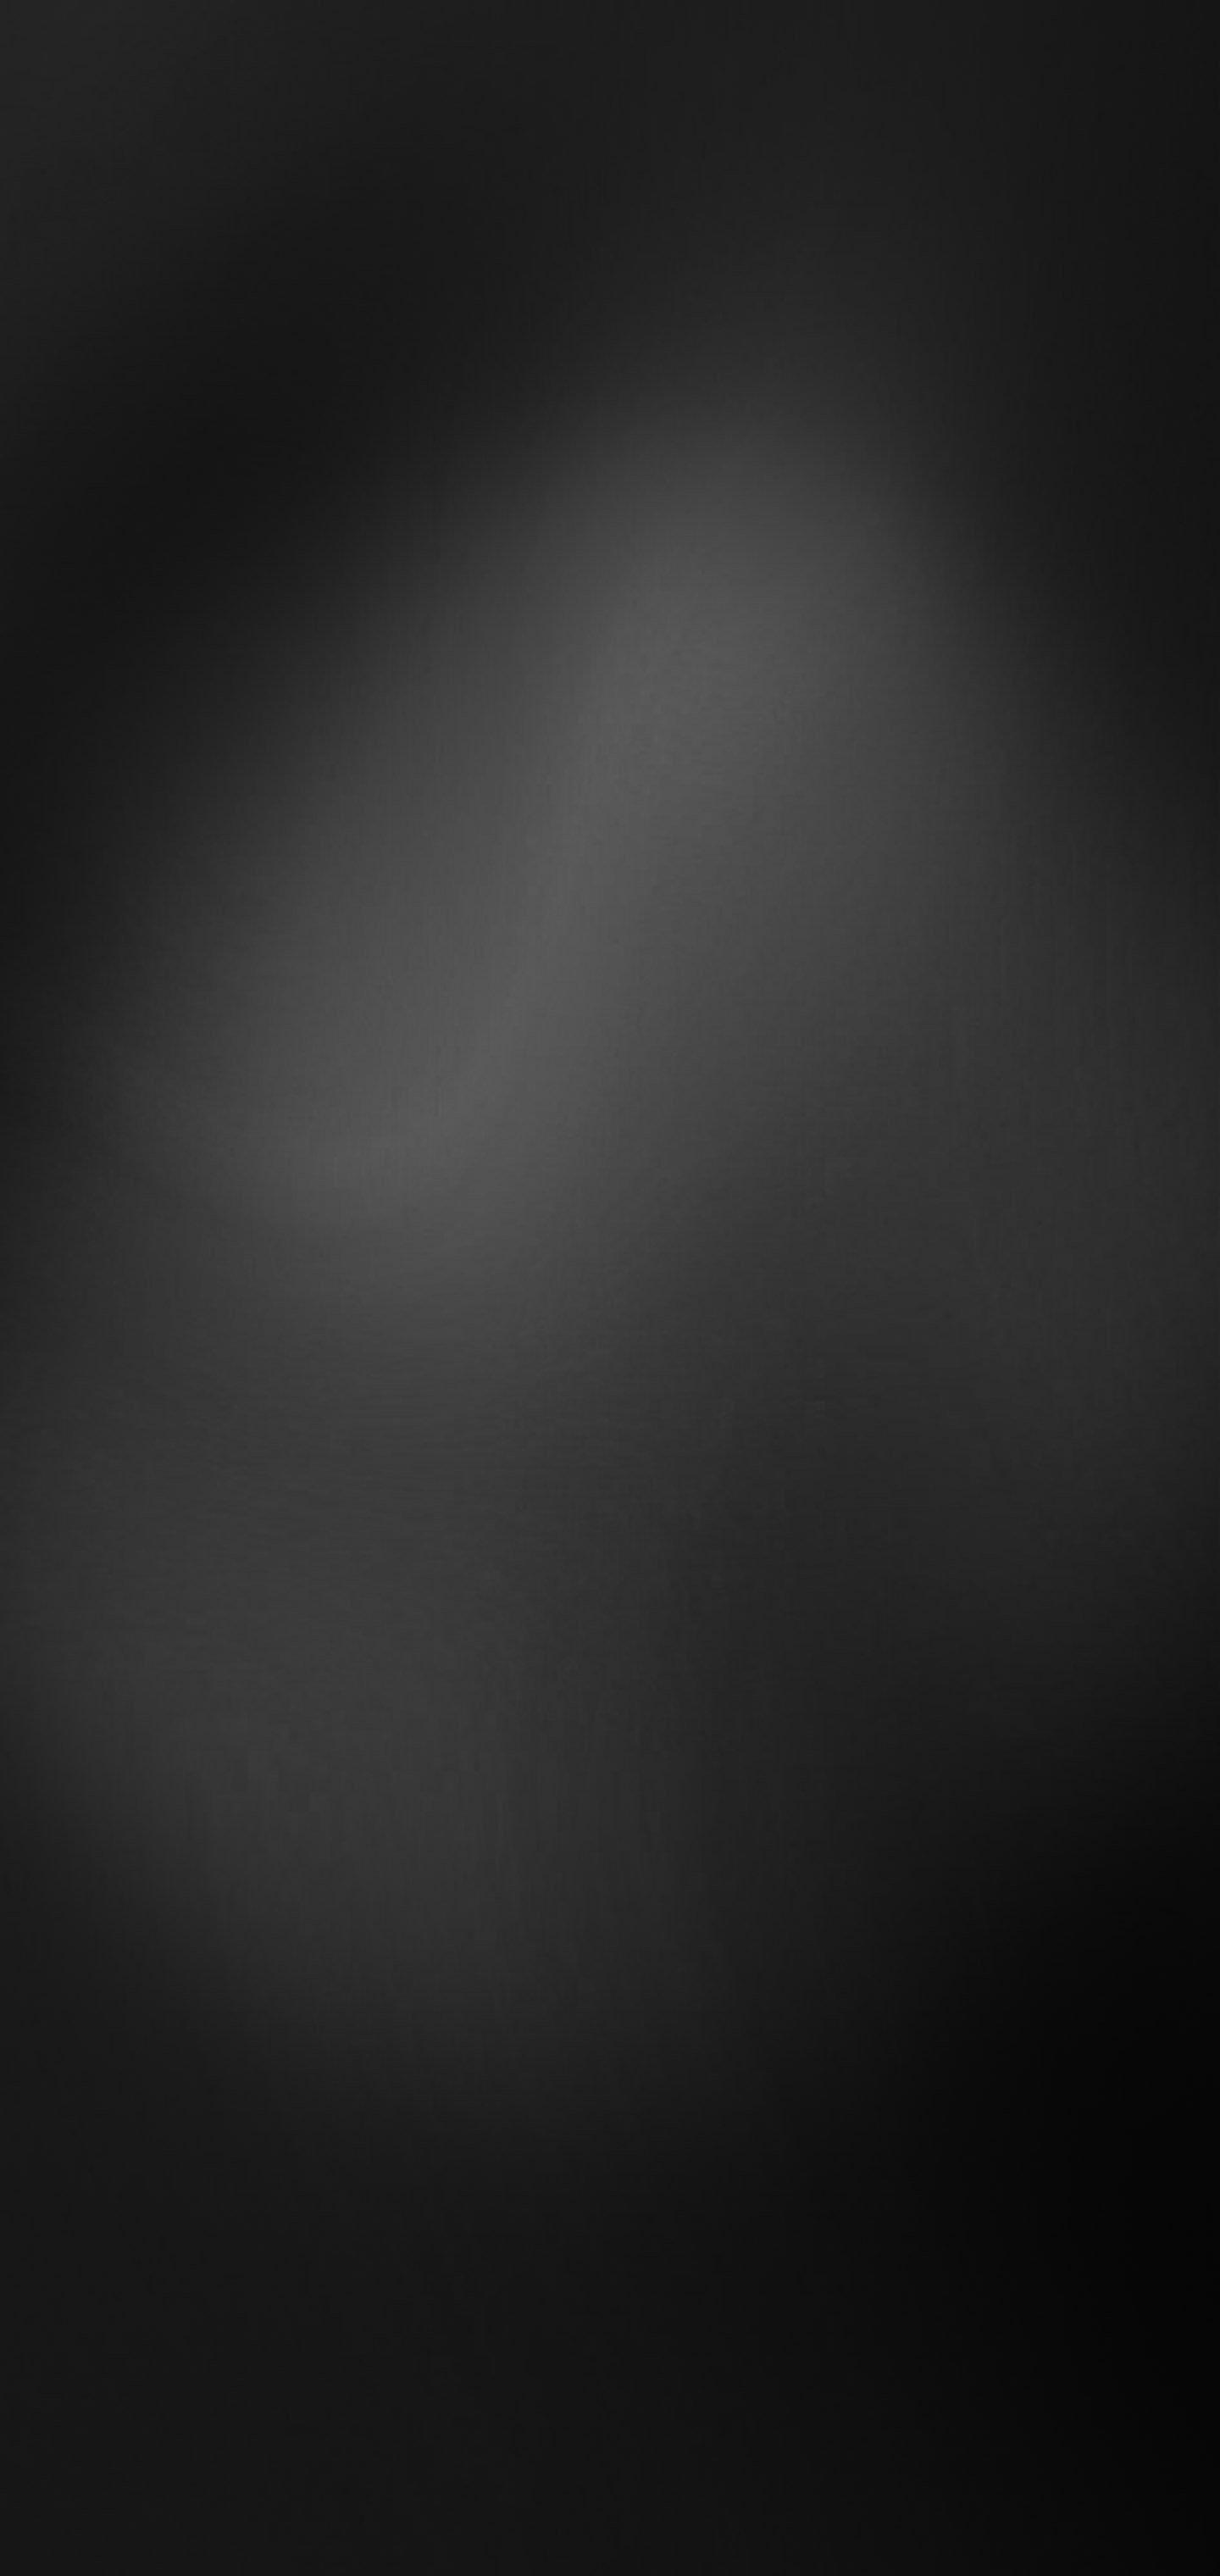 iPhone 12 Black Stock Original Wallpaper 1440x3040